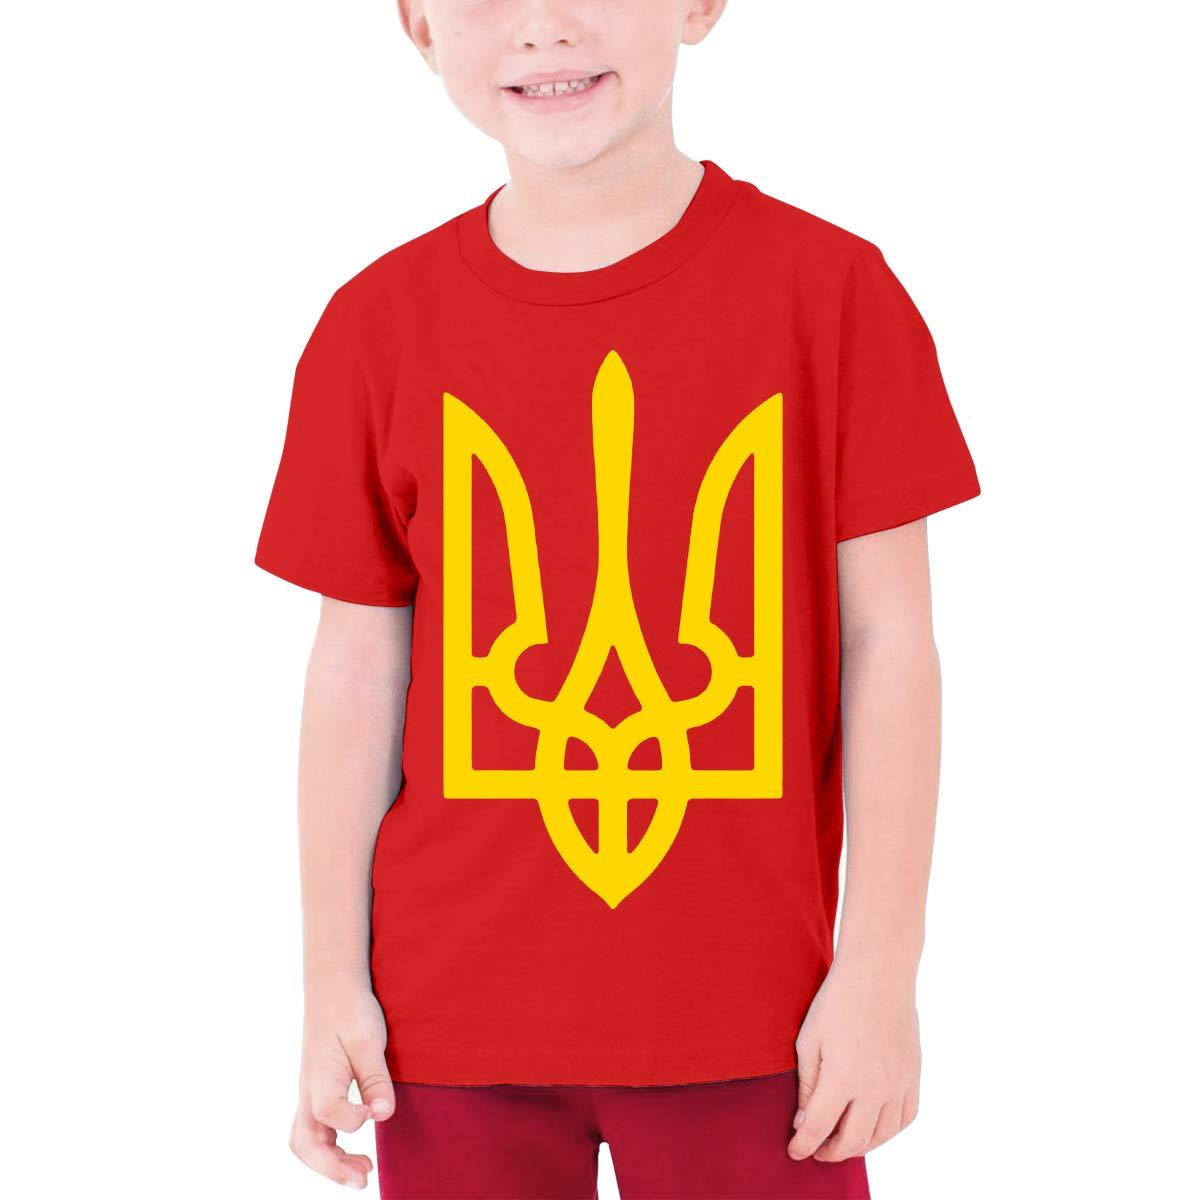 Retro-Feel Ukrainian Coat of Arms Boy Boys Girl Teens Short Sleeve CottonRound NeckTees Fashion Cute T Shirt Unisex